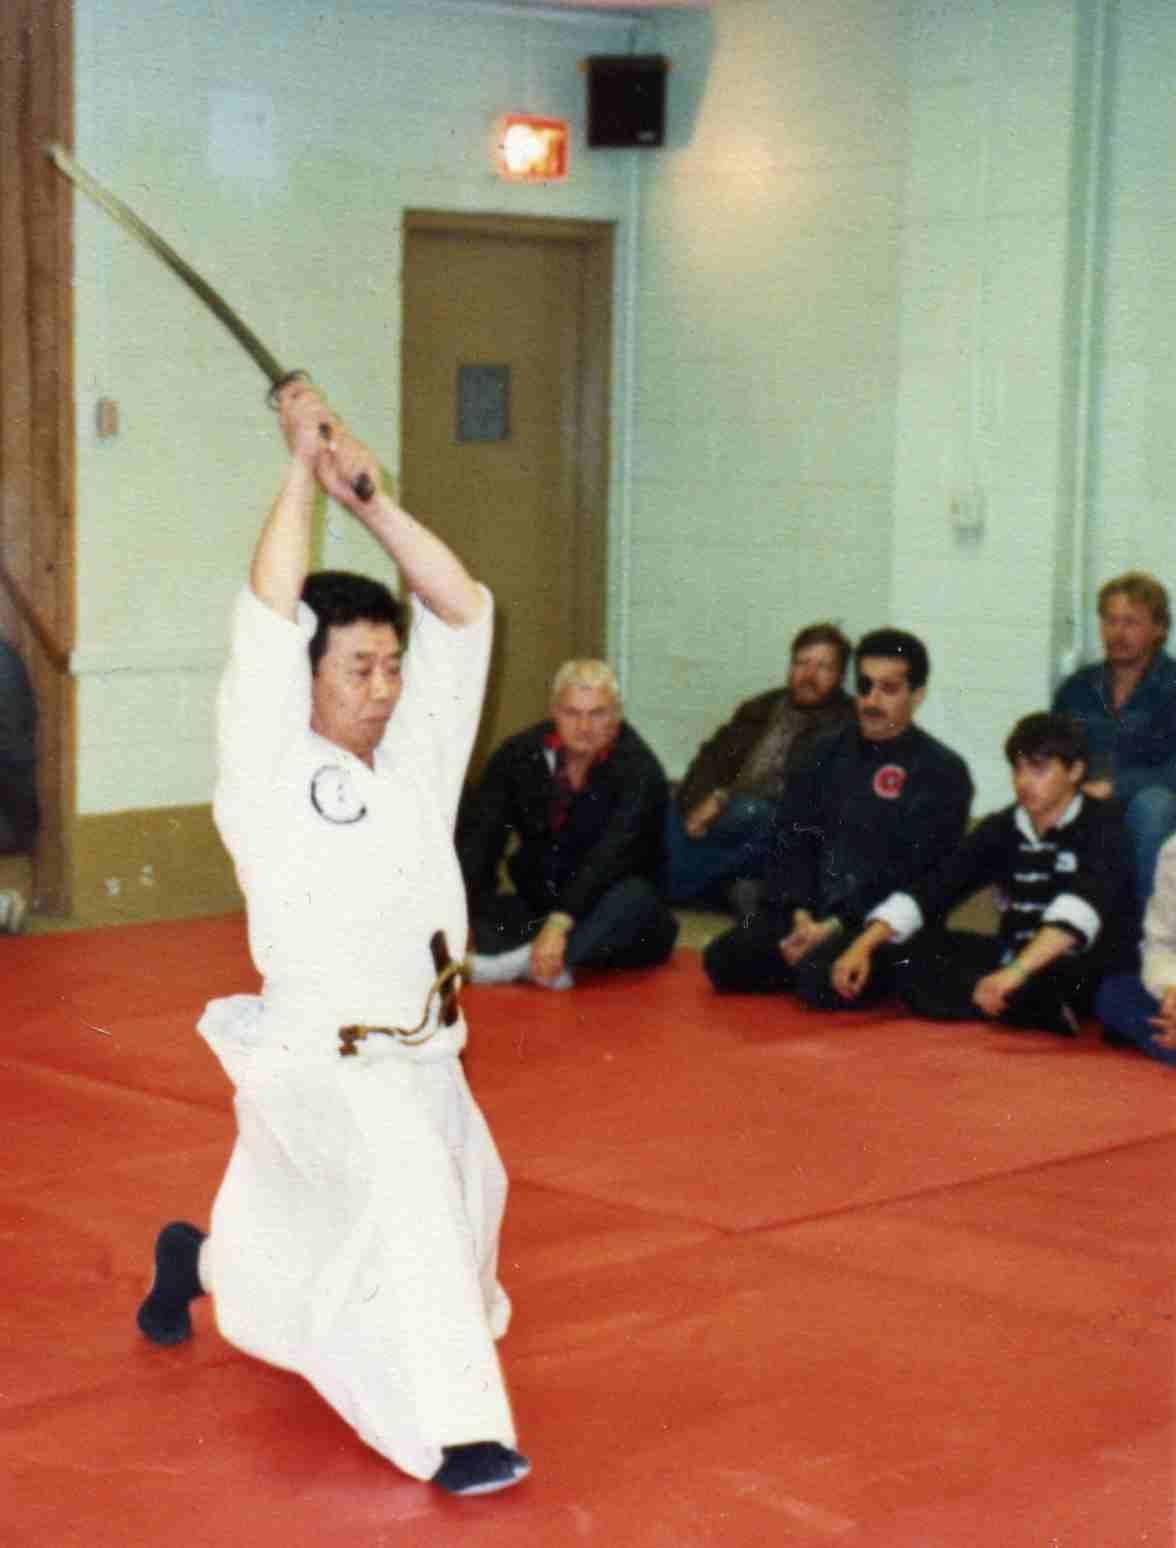 Tetsudokan Jujitsu International Kendo Martial Arts Japanese Sword